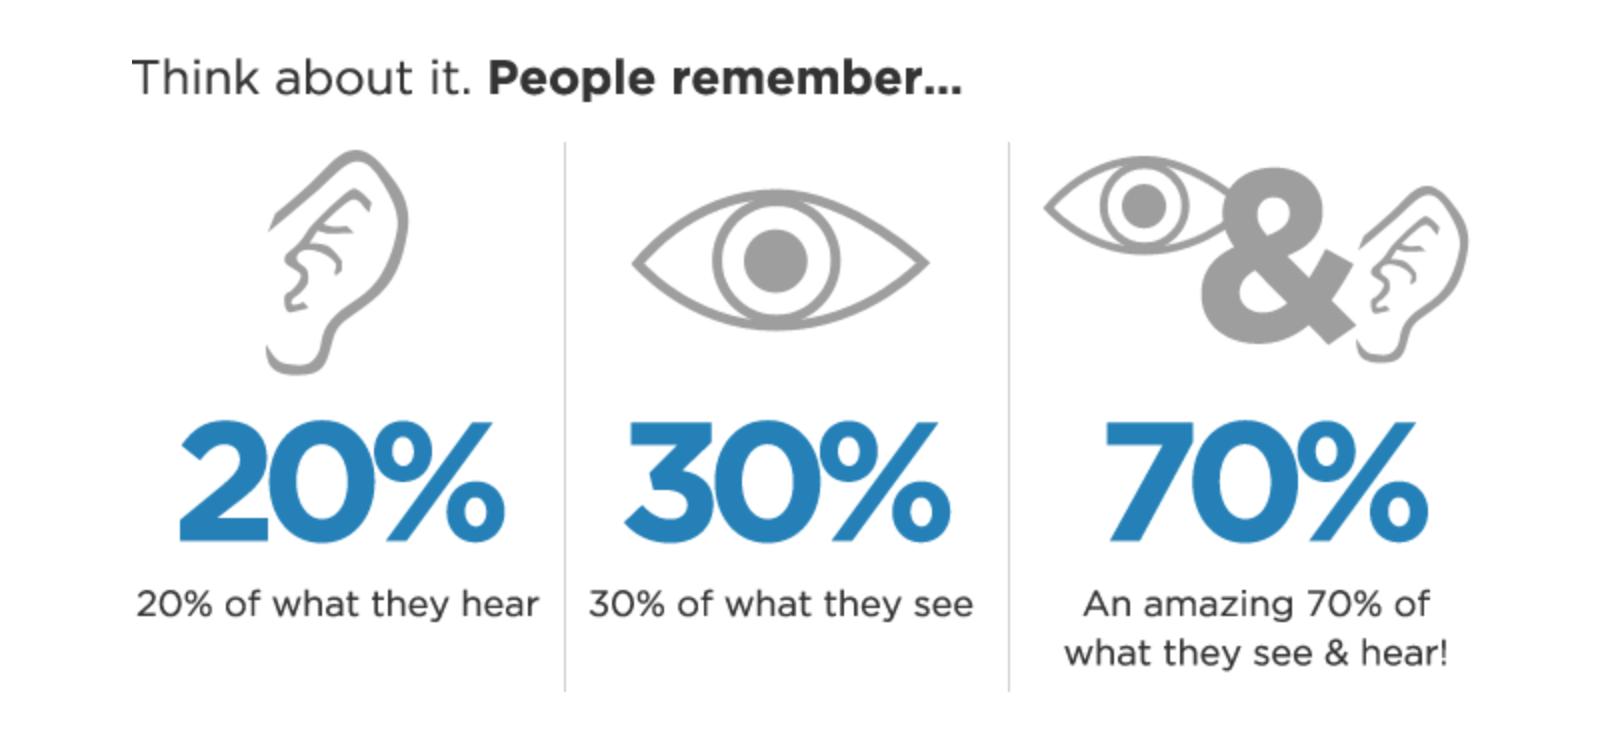 Image courtesy of:https://vidianmedia.com/video-marketing-statistics/